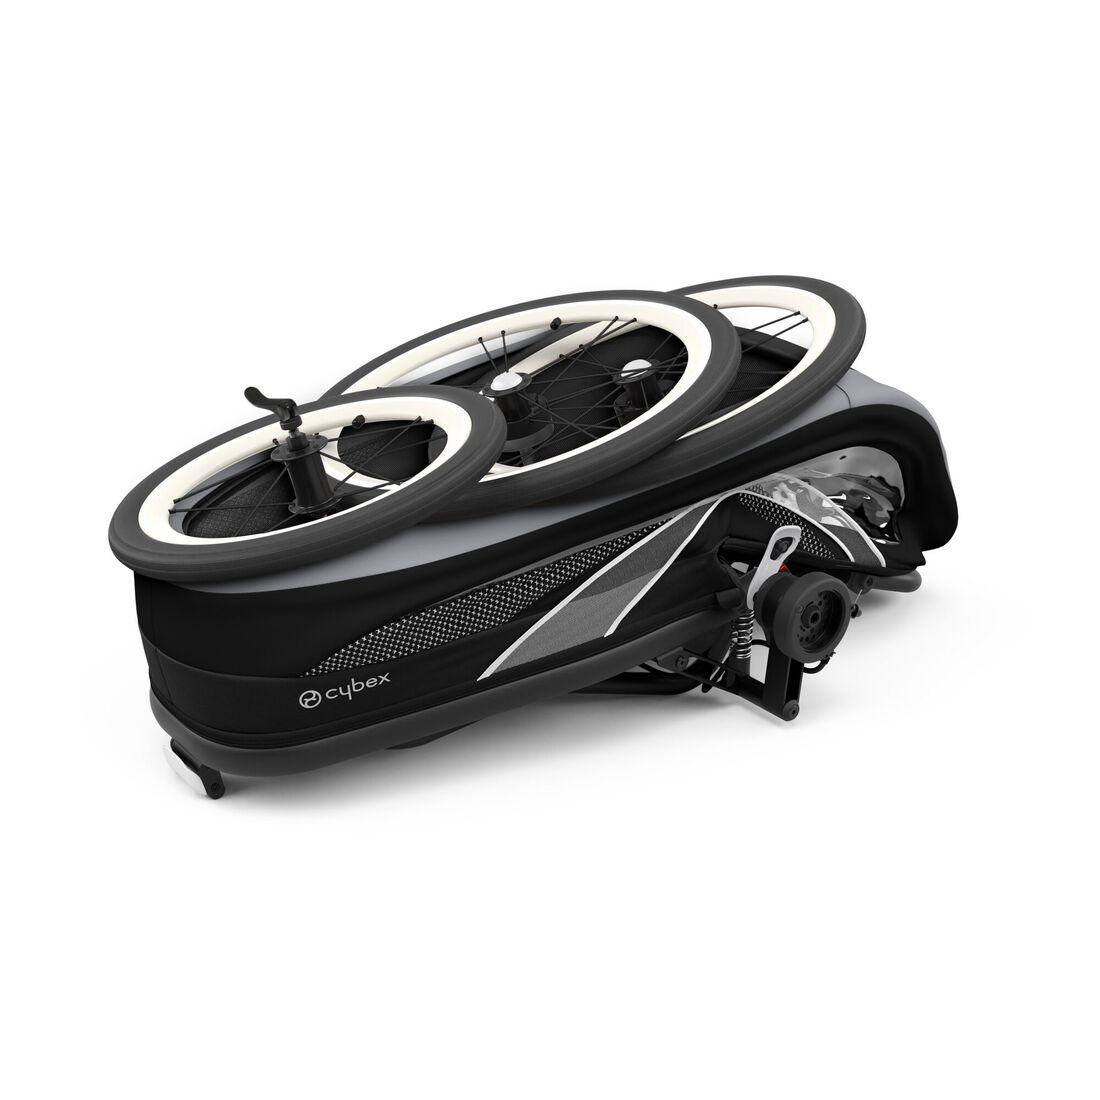 CYBEX Zeno Sitzpaket - All Black in All Black large Bild 6